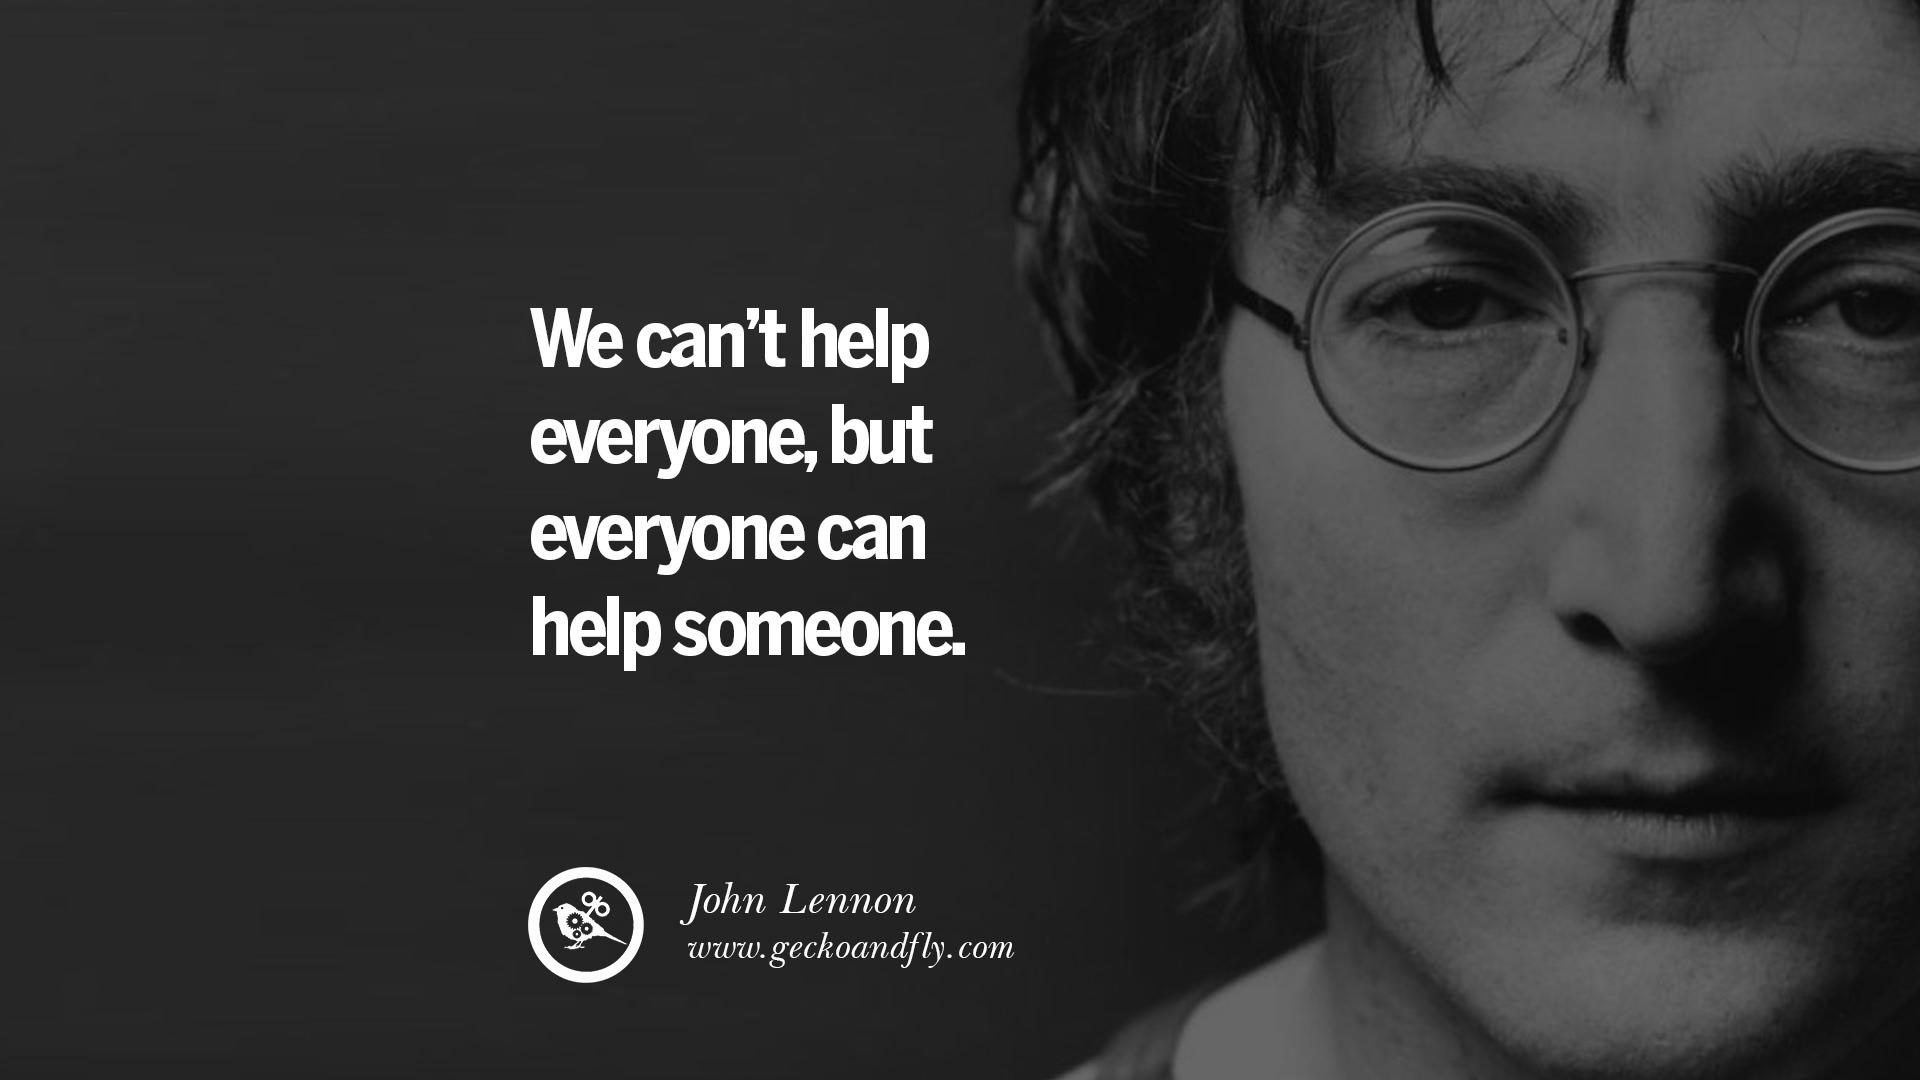 John Lennon Love Quotes : 15 John Lennon Quotes on Love, Imagination, Peace and Death